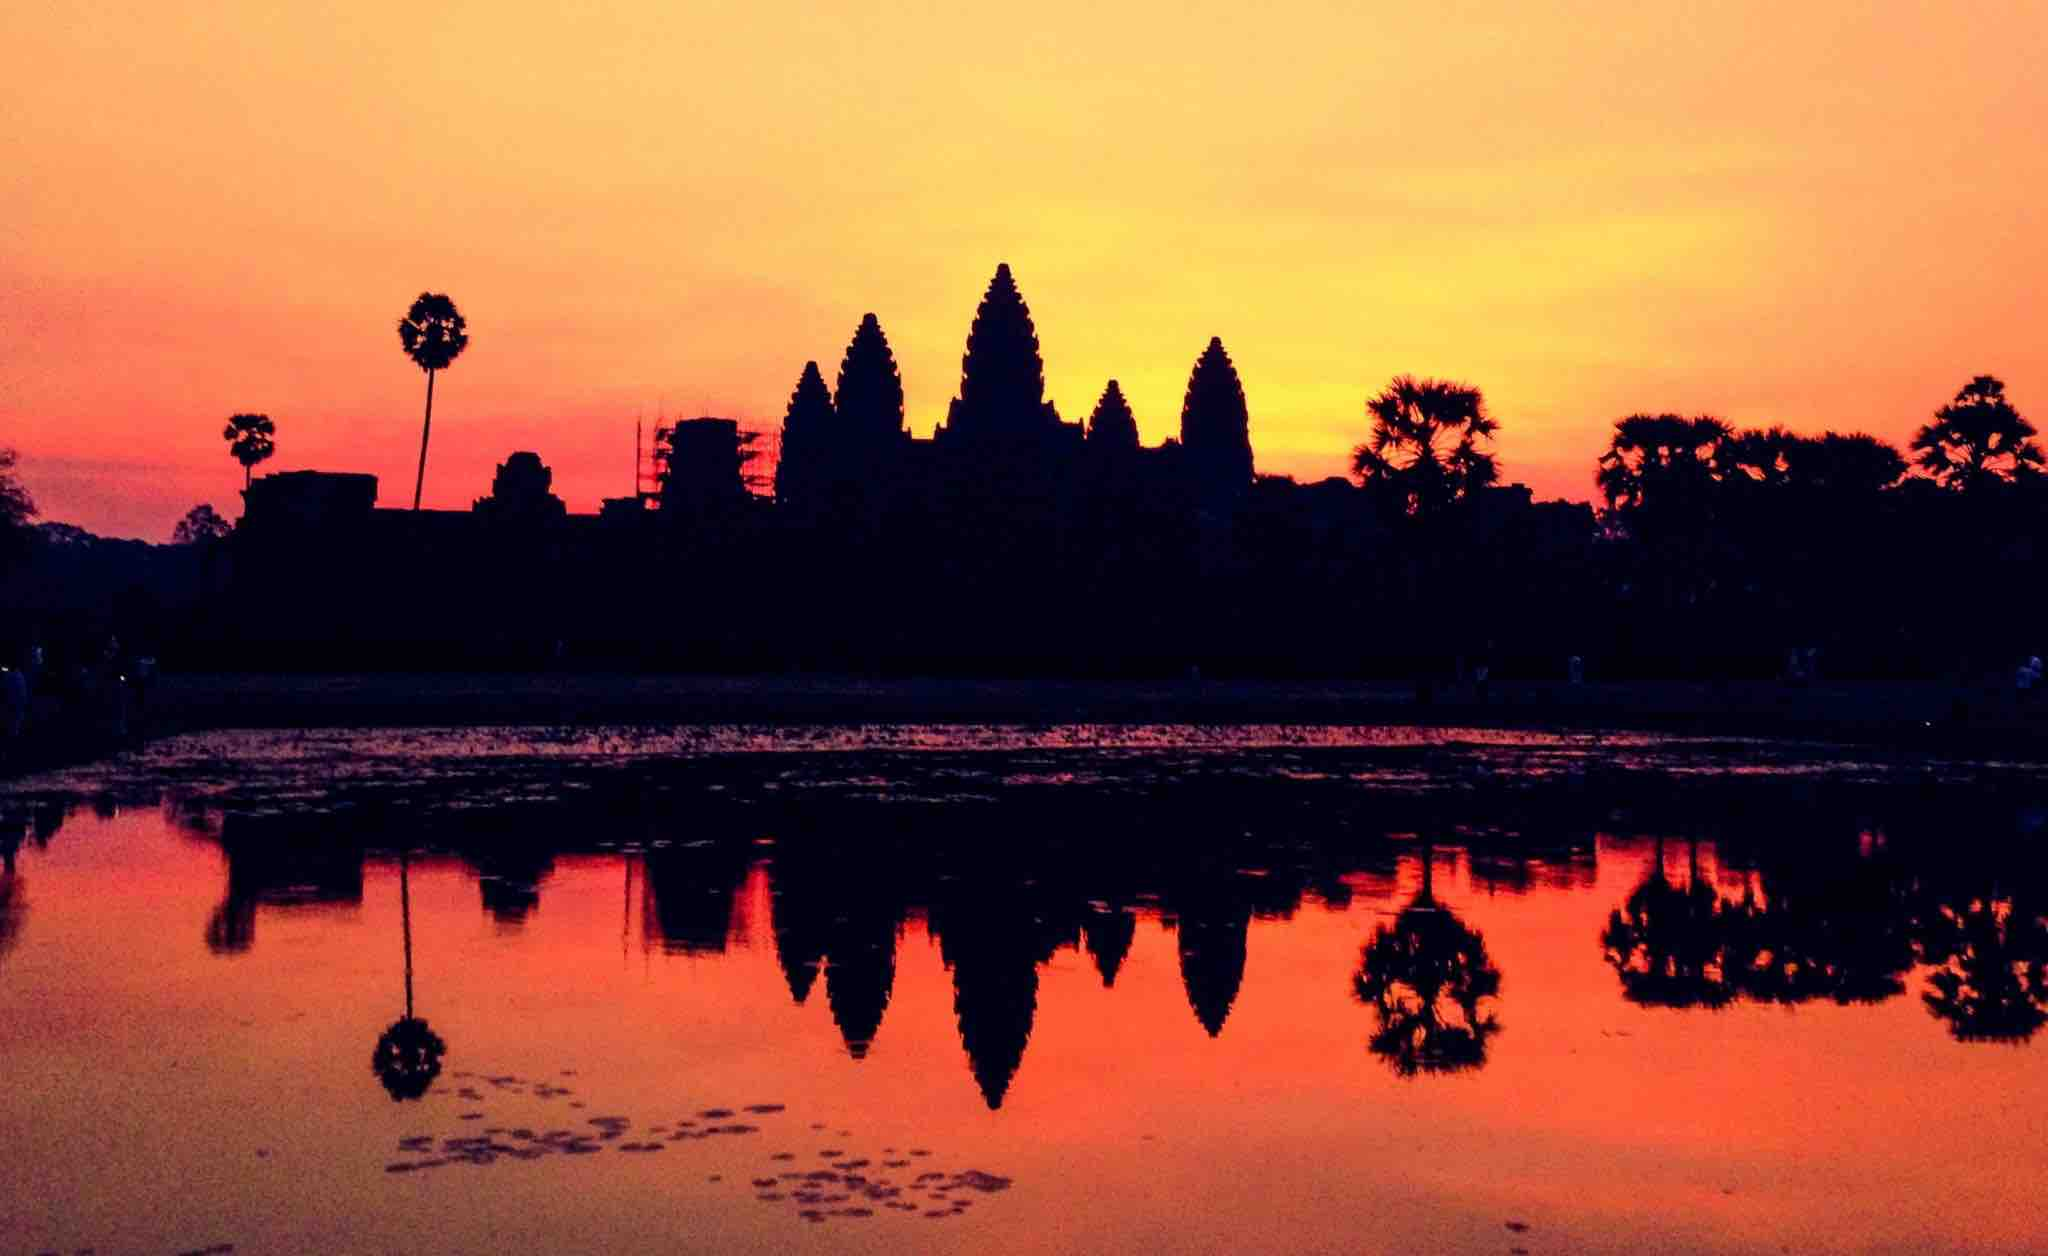 angkor wat sunrise siem reap cambodia